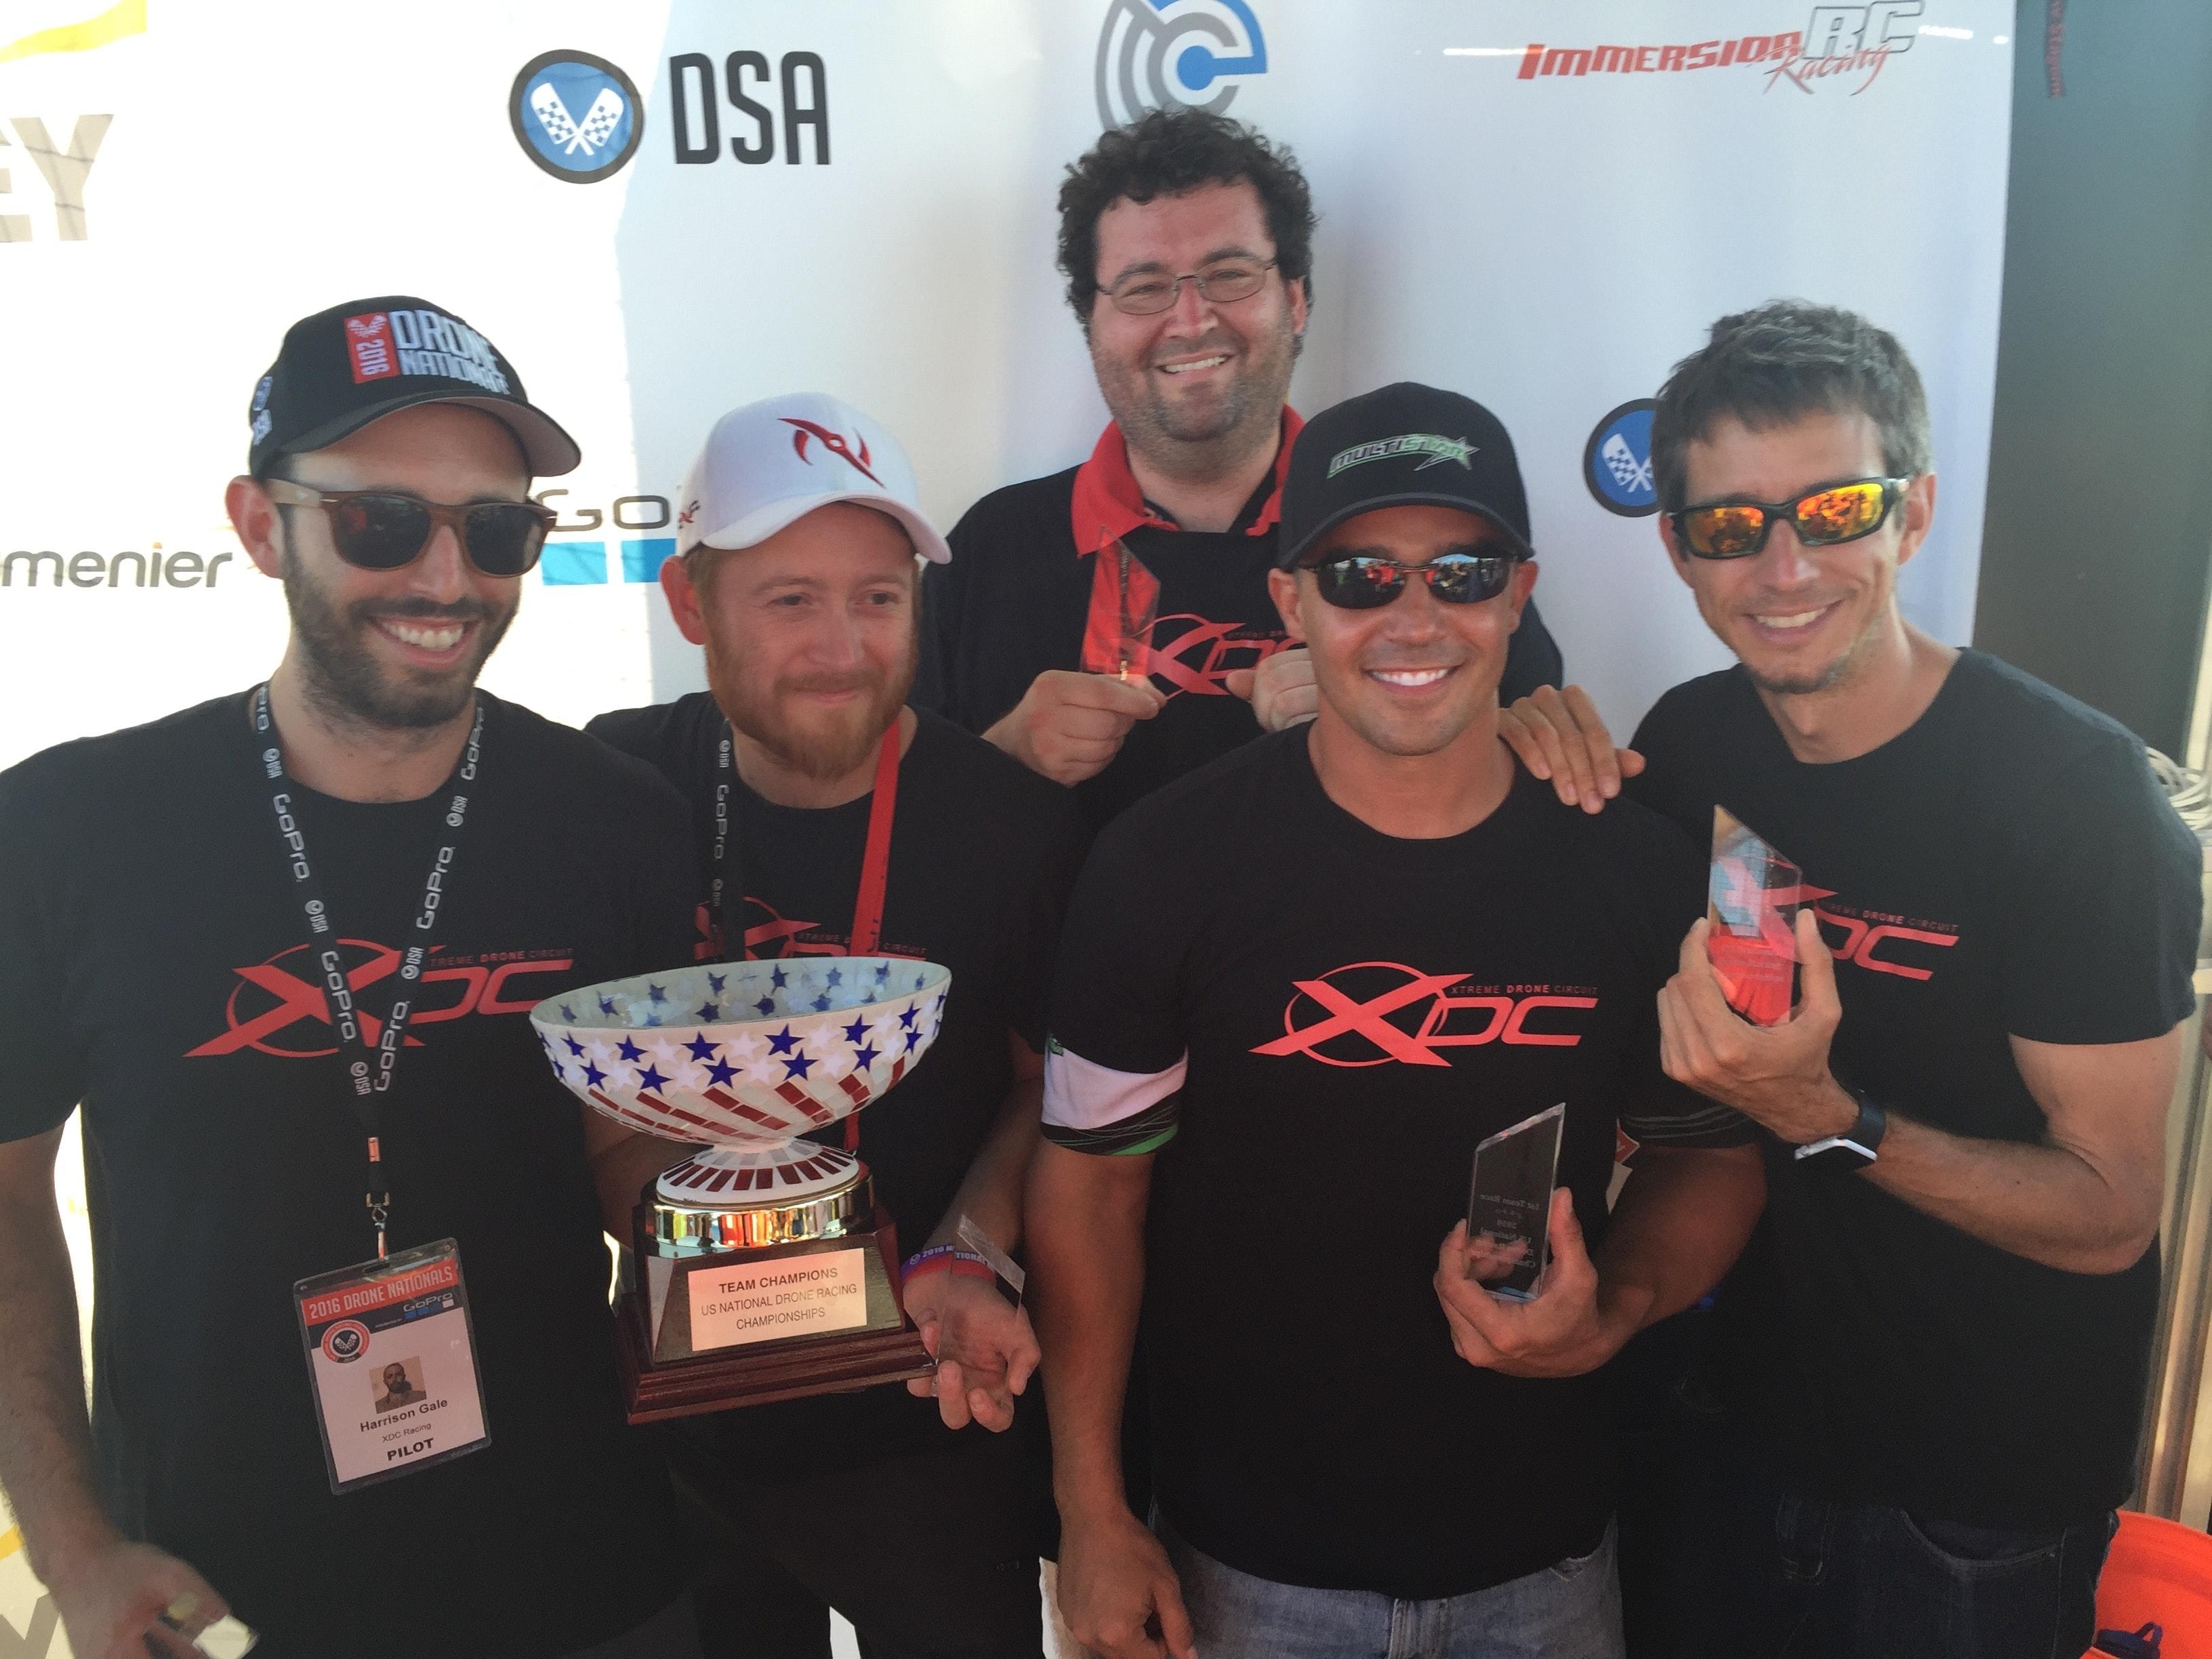 Morris, far right, celebrating his win.